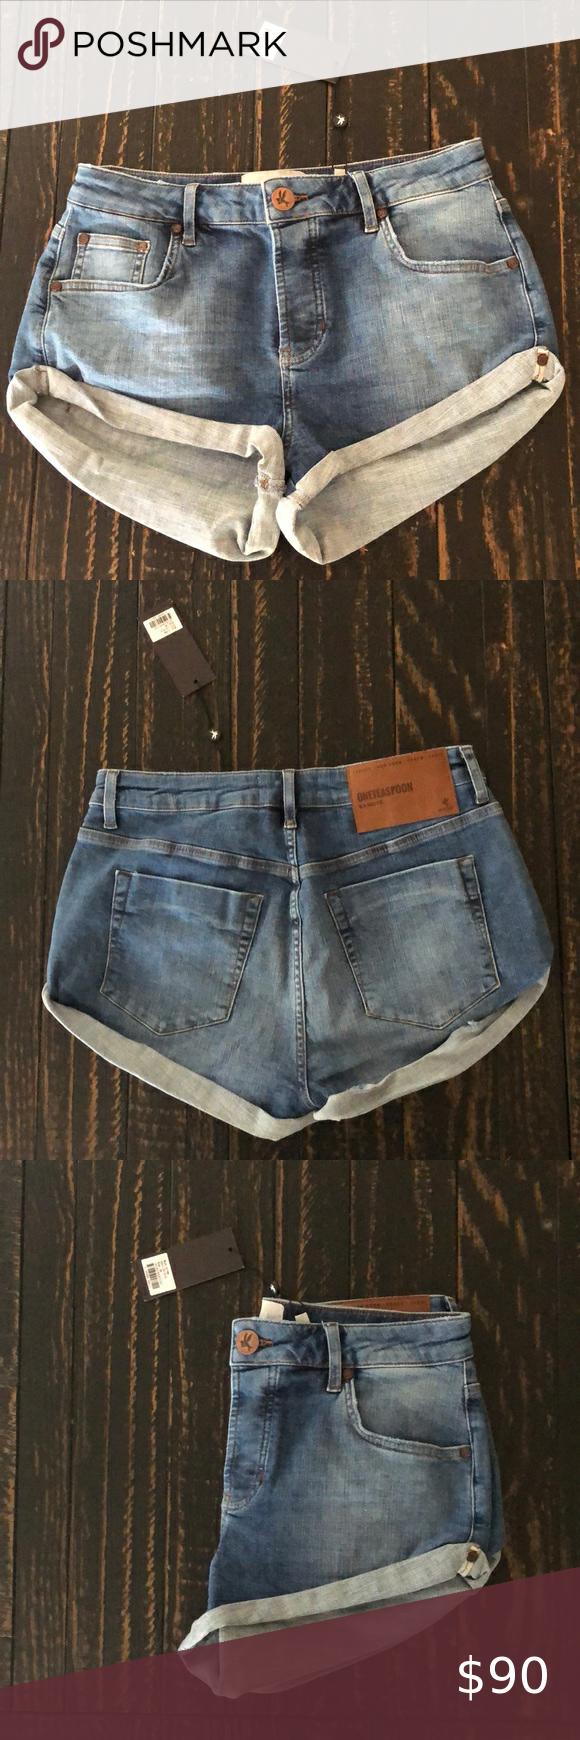 One Teaspoon Jean Shorts In 2020 Jean Shorts One Teaspoon Shorts Shorts